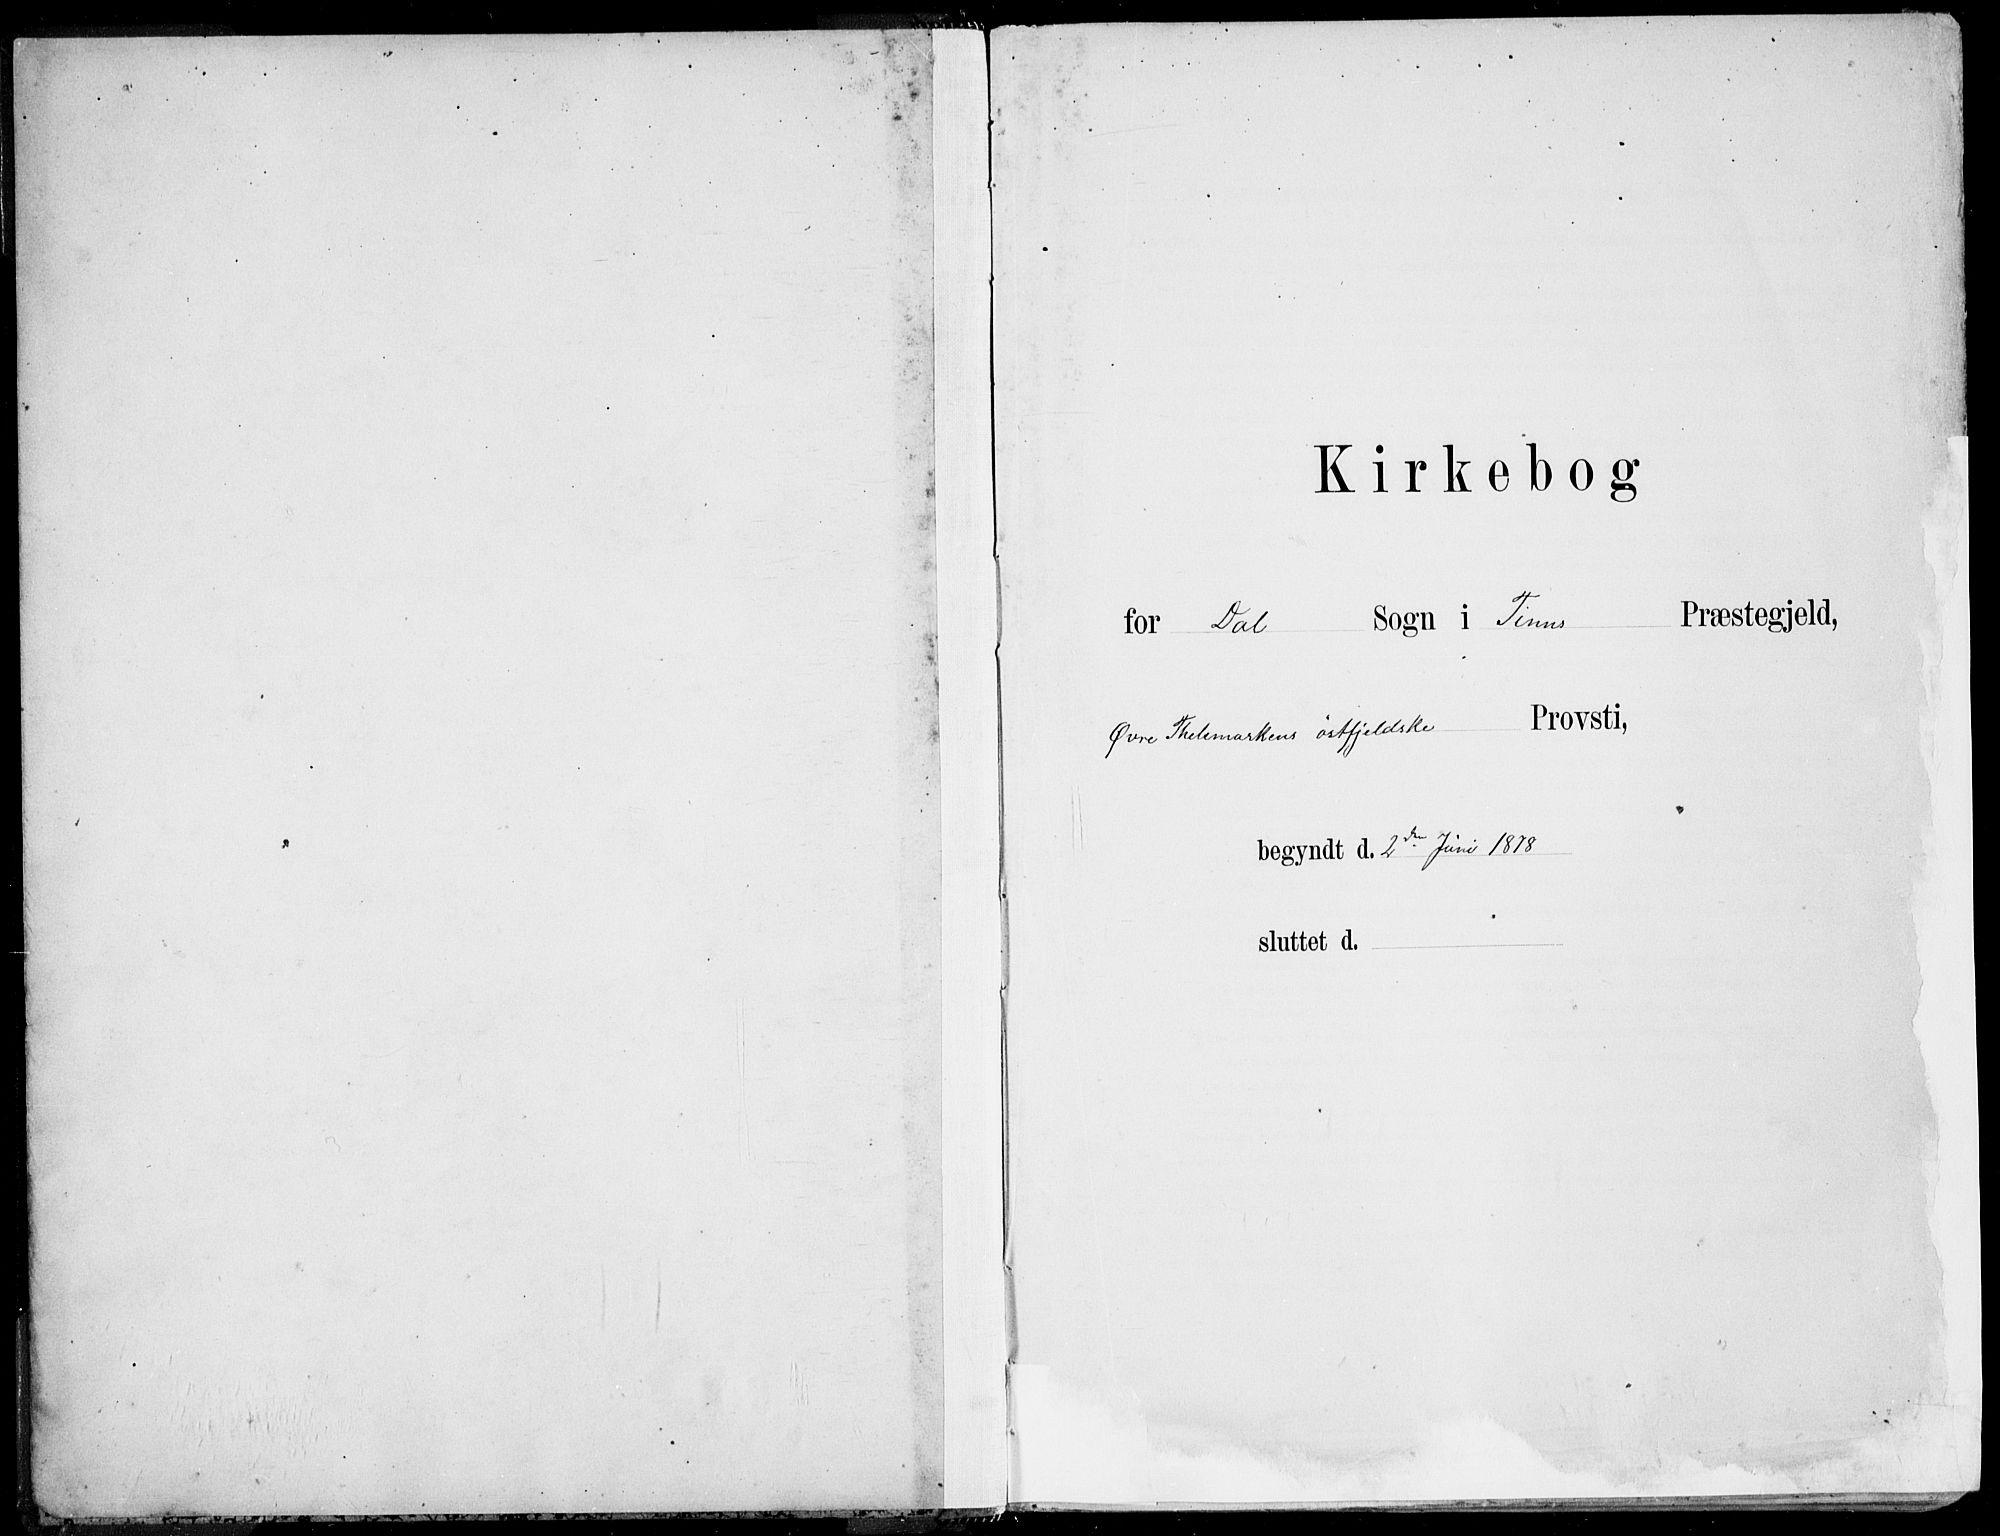 SAKO, Rjukan kirkebøker, F/Fa/L0001: Parish register (official) no. 1, 1878-1912